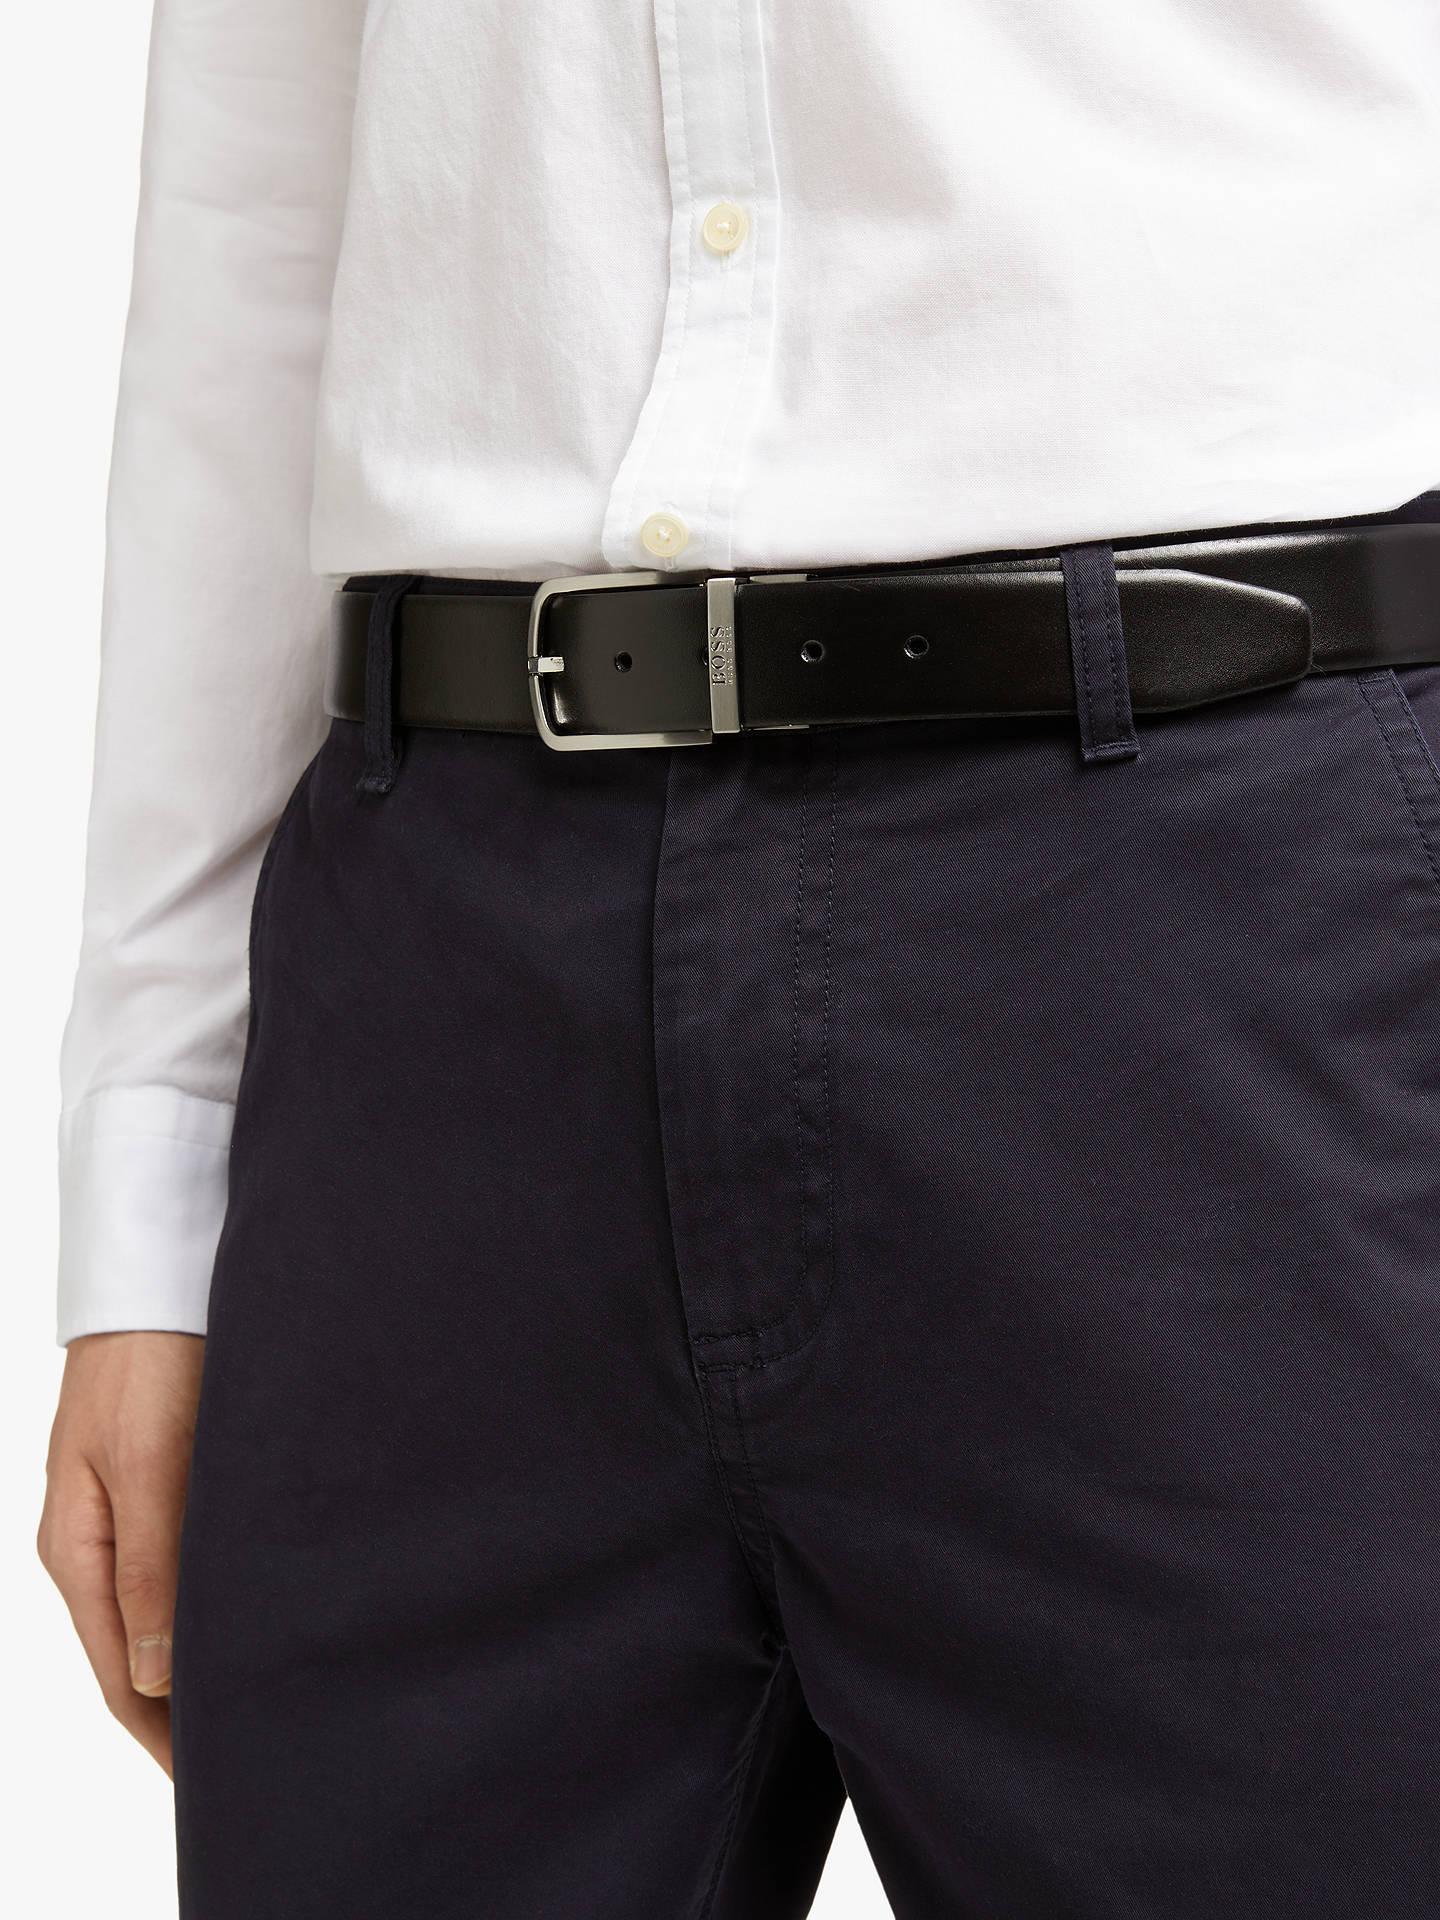 e4e761bb85 ... Buy BOSS Owen Reversible Leather Belt, One Size, Black/Brown Online at  johnlewis ...